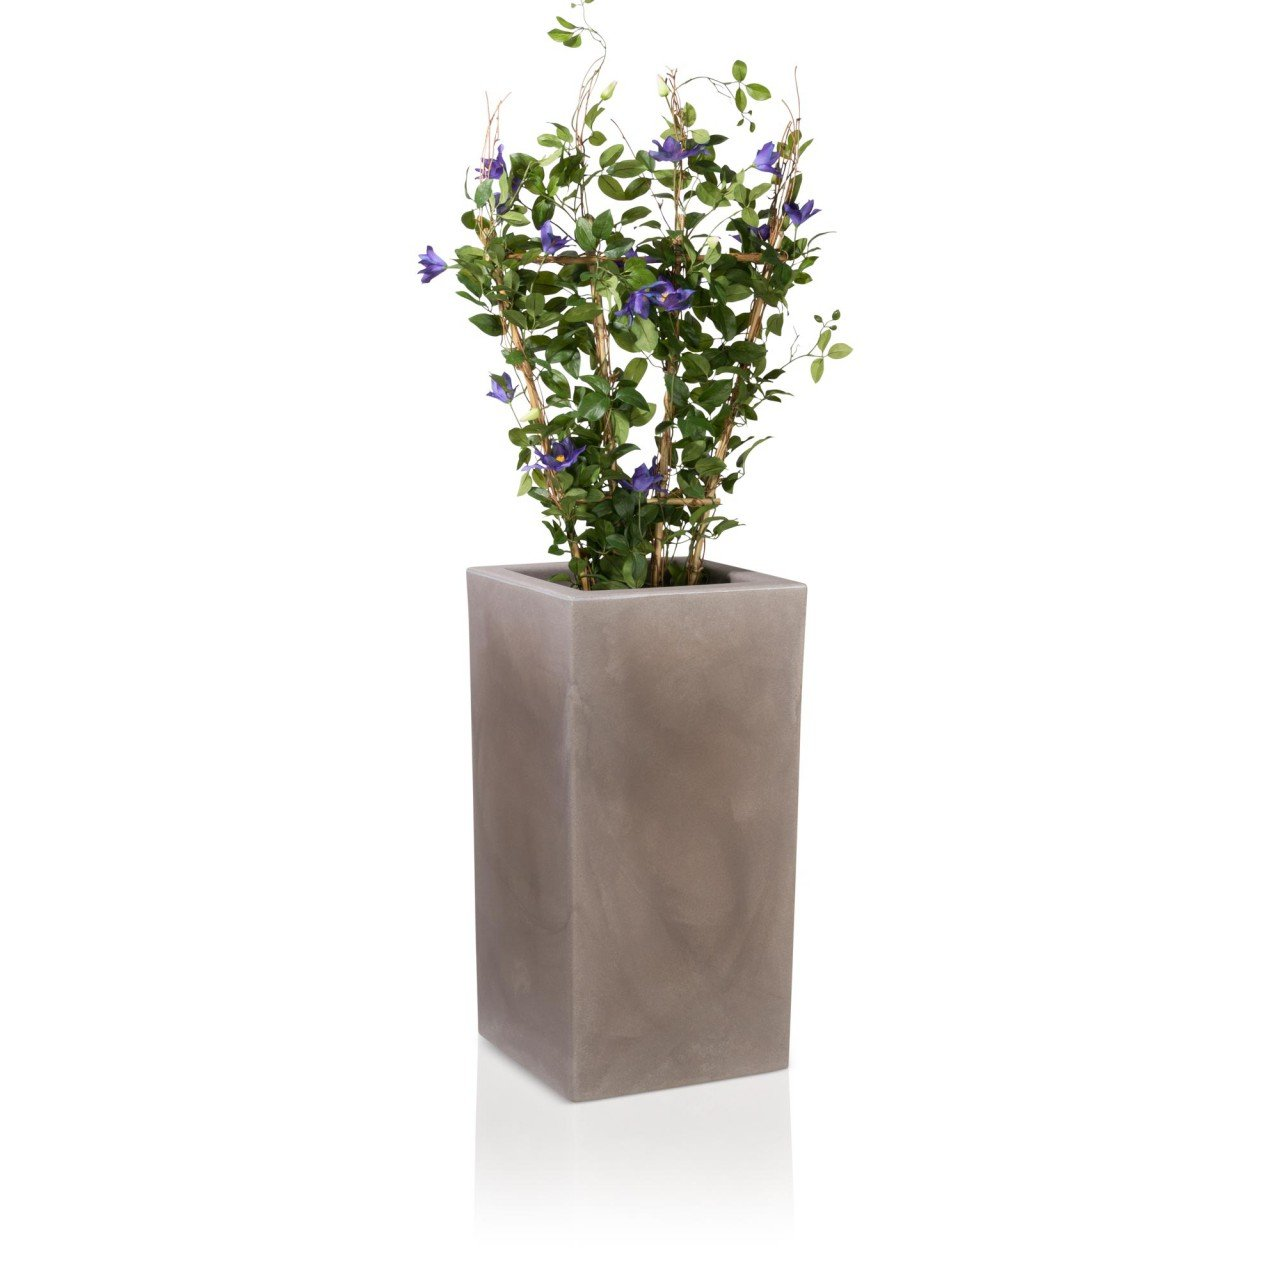 pflanzk bel blumenk bel torre 80 kunststoff 40x40x80 cm beige matt g nstig online kaufen. Black Bedroom Furniture Sets. Home Design Ideas